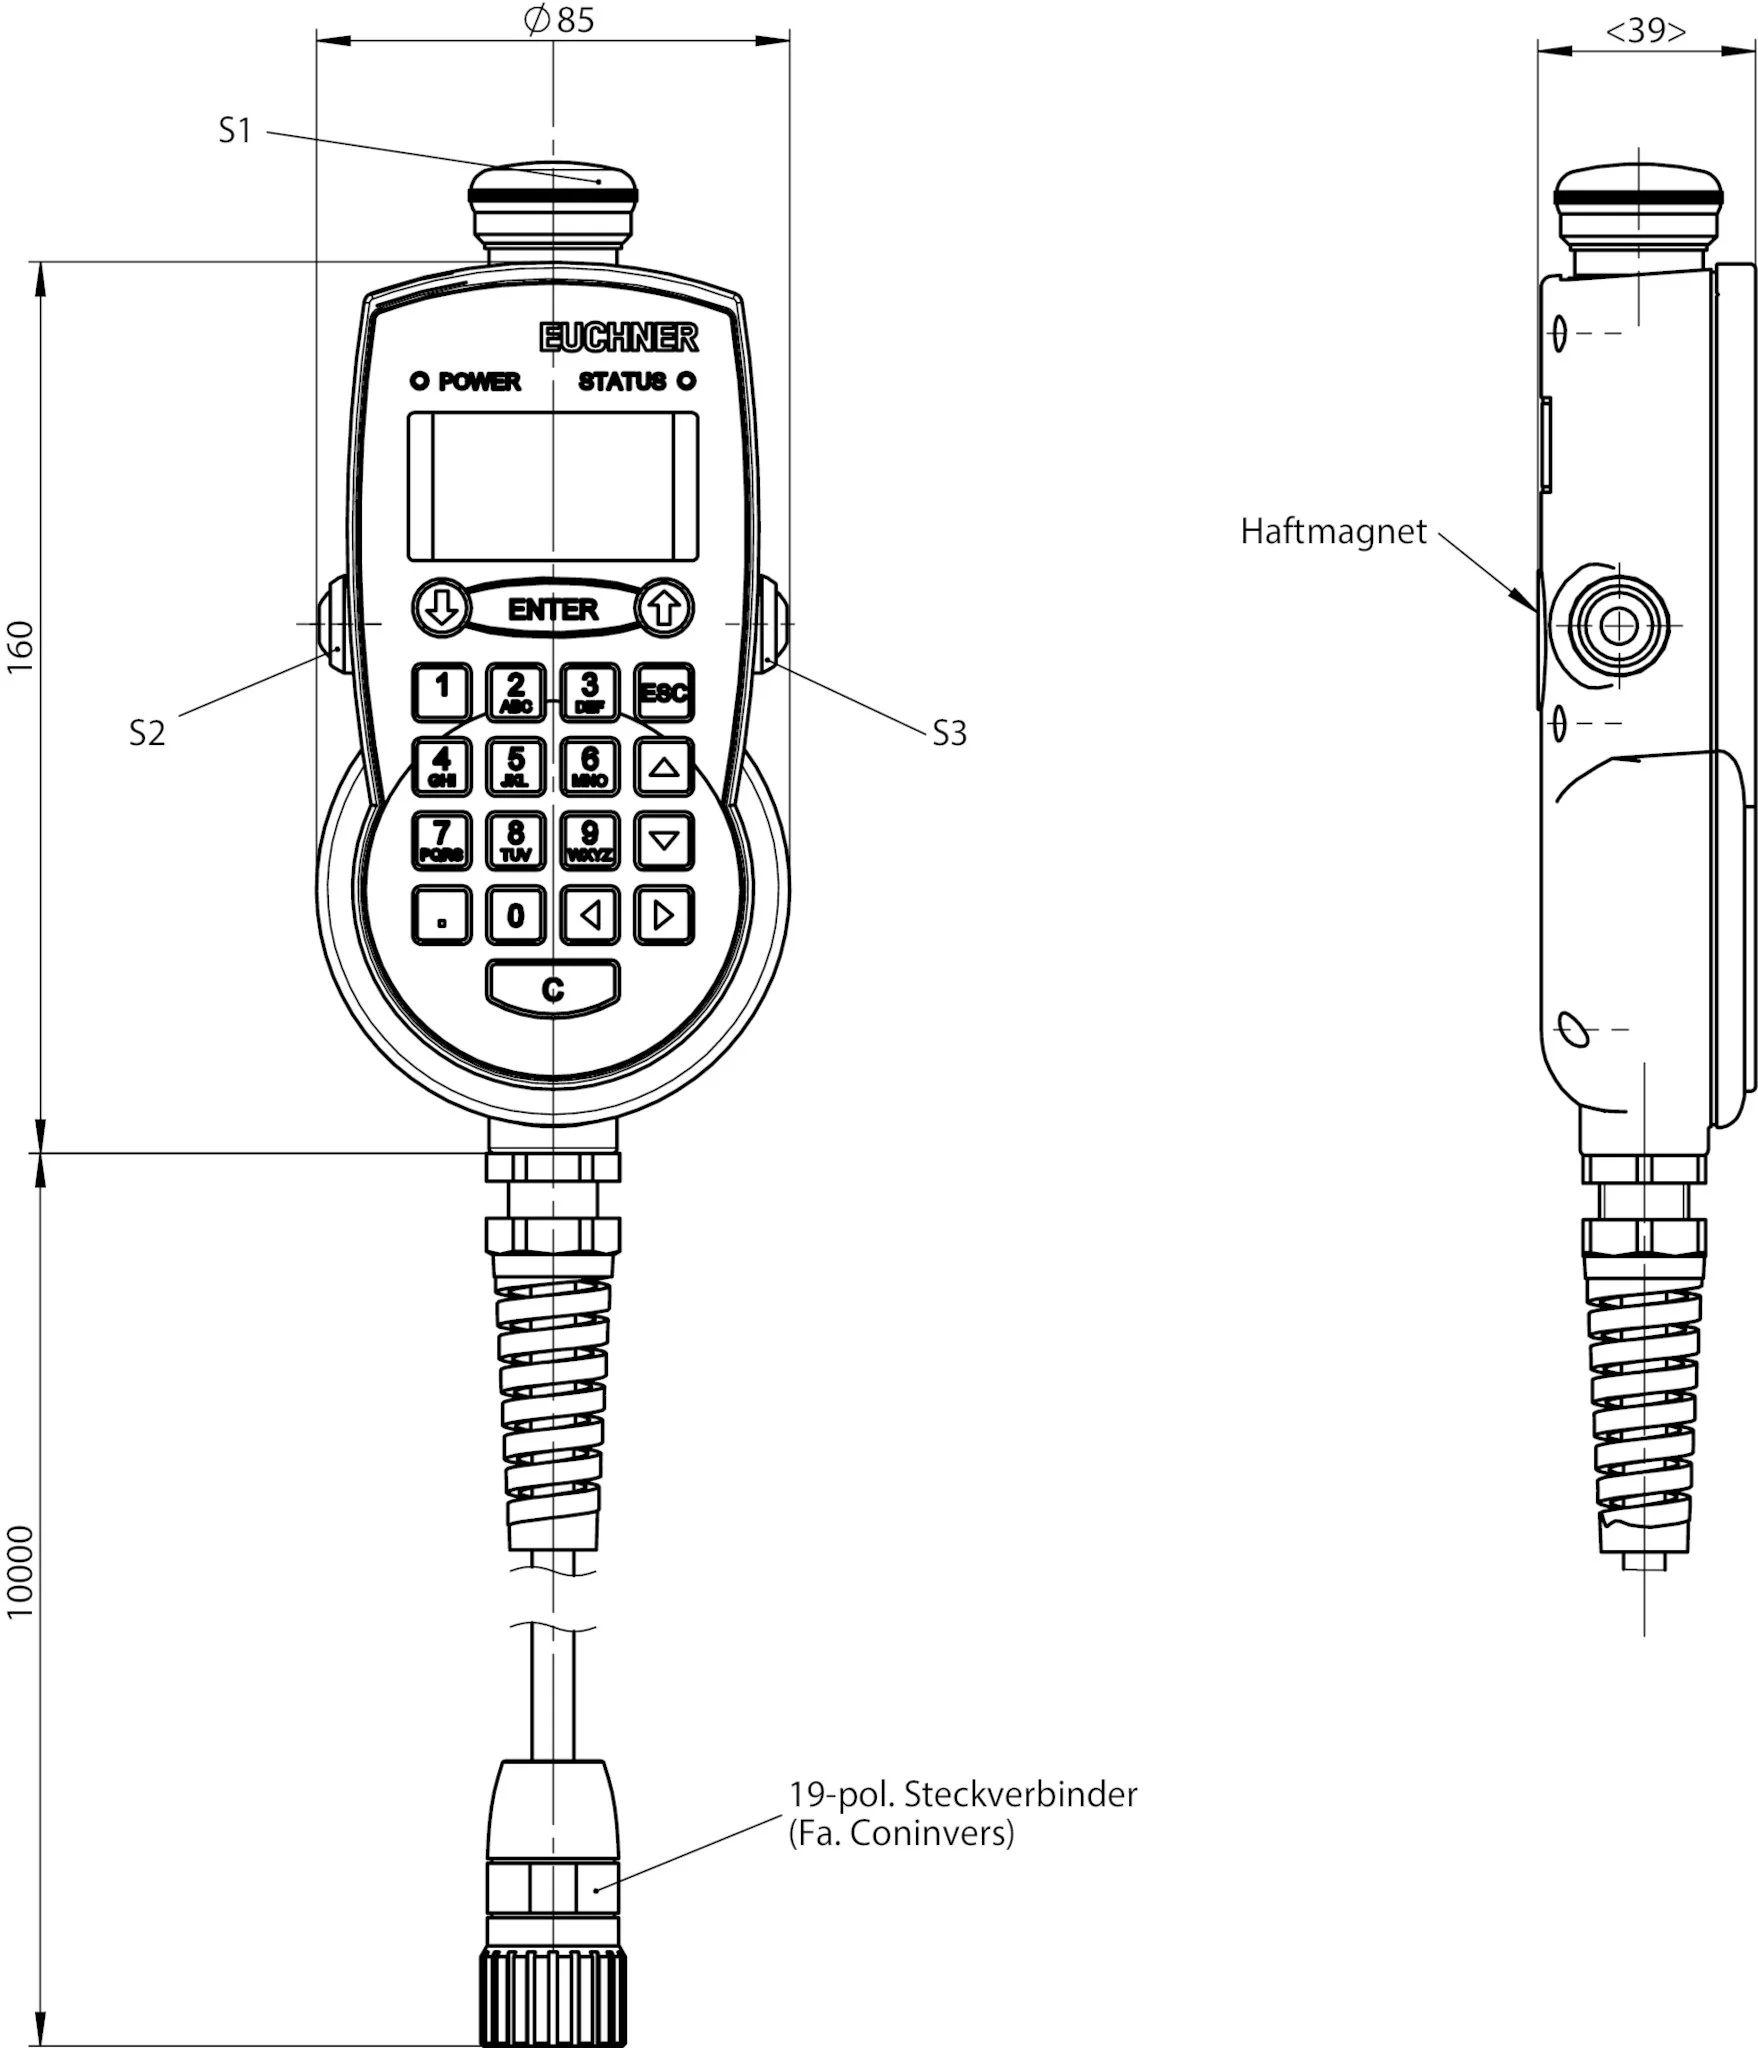 tamper wiring diagram for